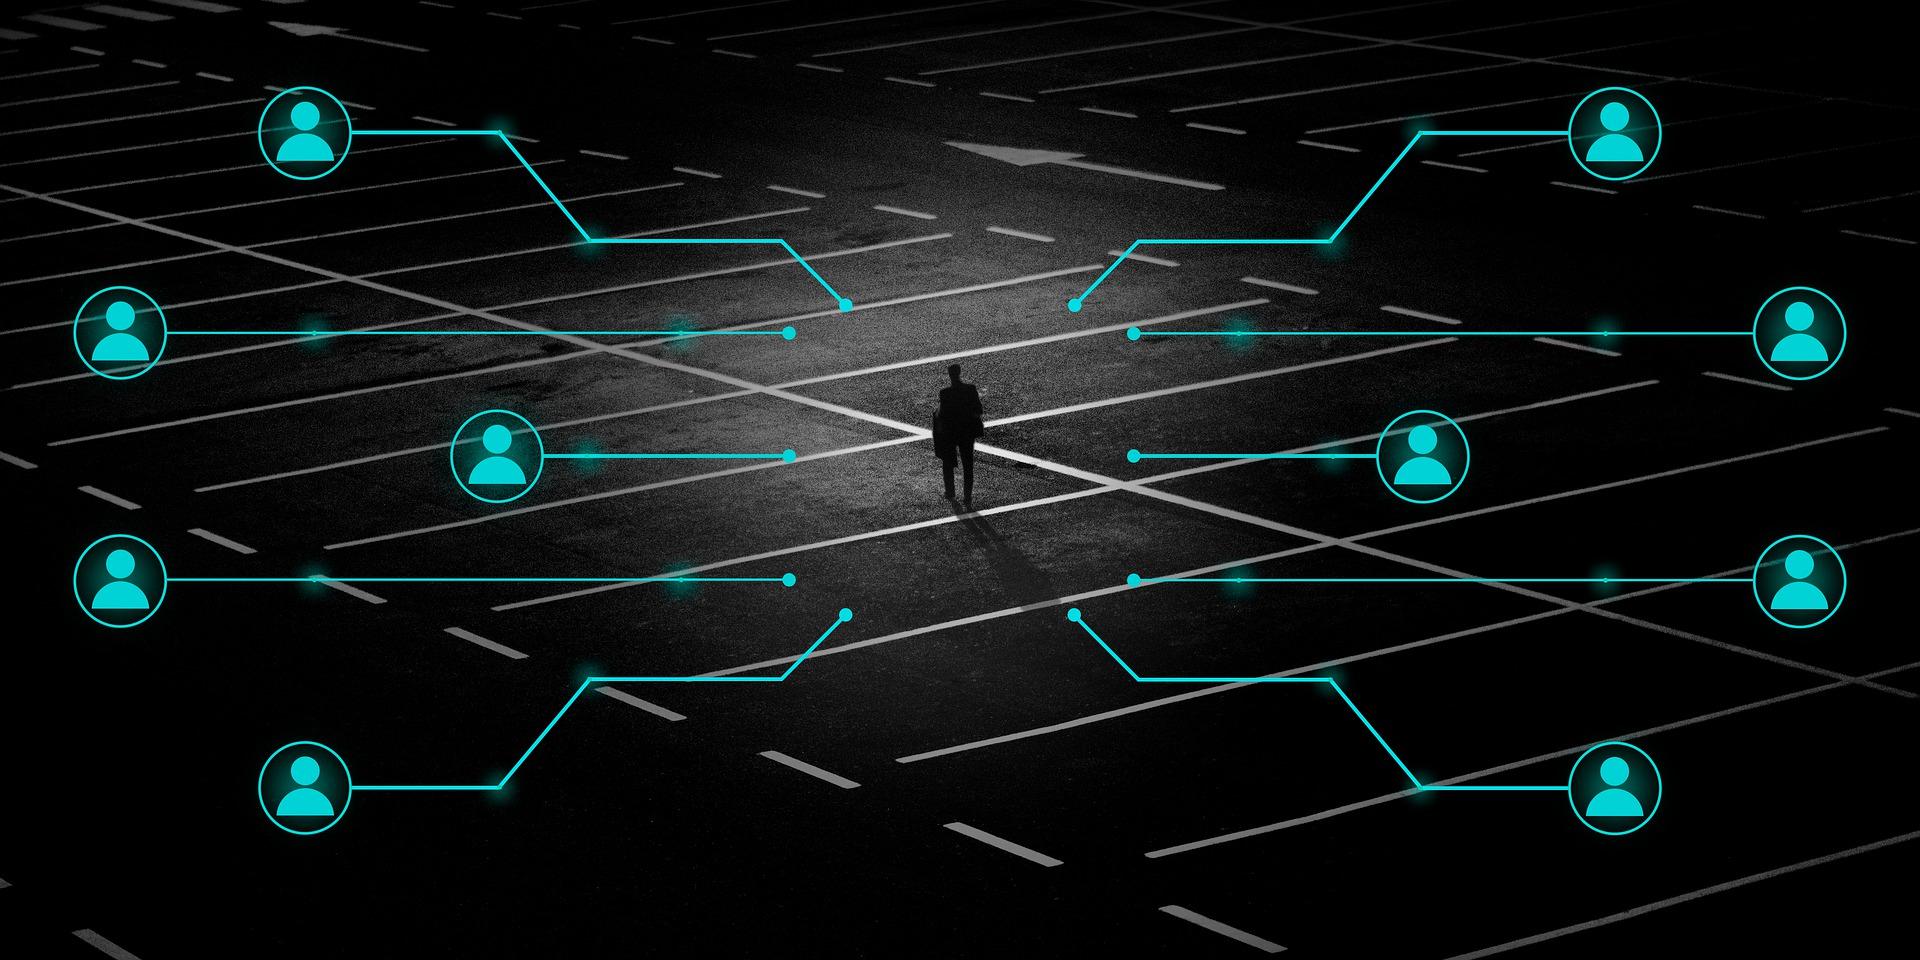 Datenschutz-Folgenabschätzung – Risikobeurteilung unter Gesamtschau aller Maßnahmen